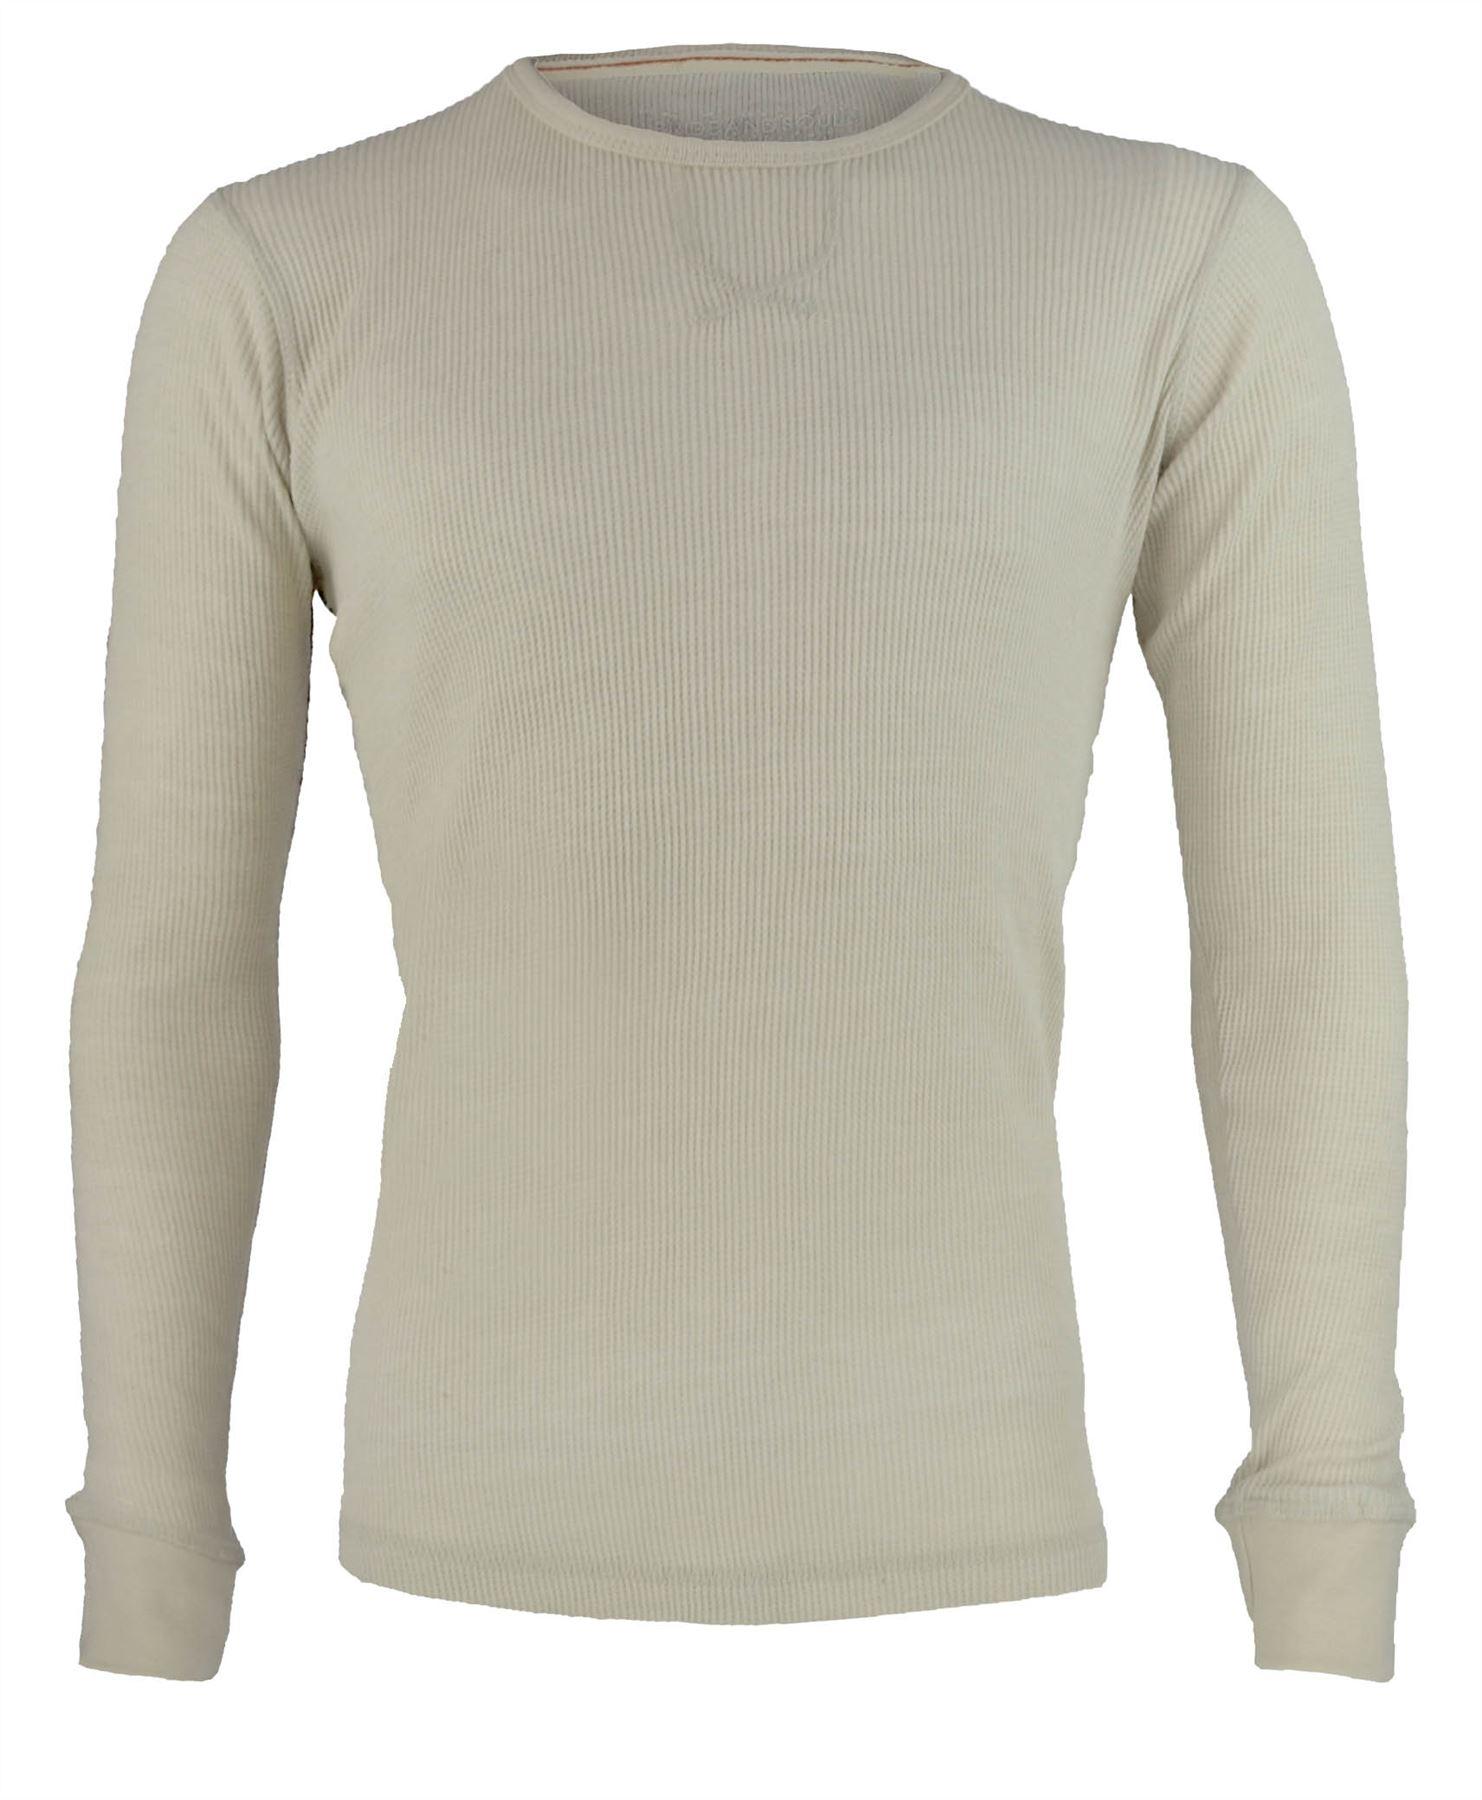 mens waffle top long sleeve round neck sweatshirt thermal